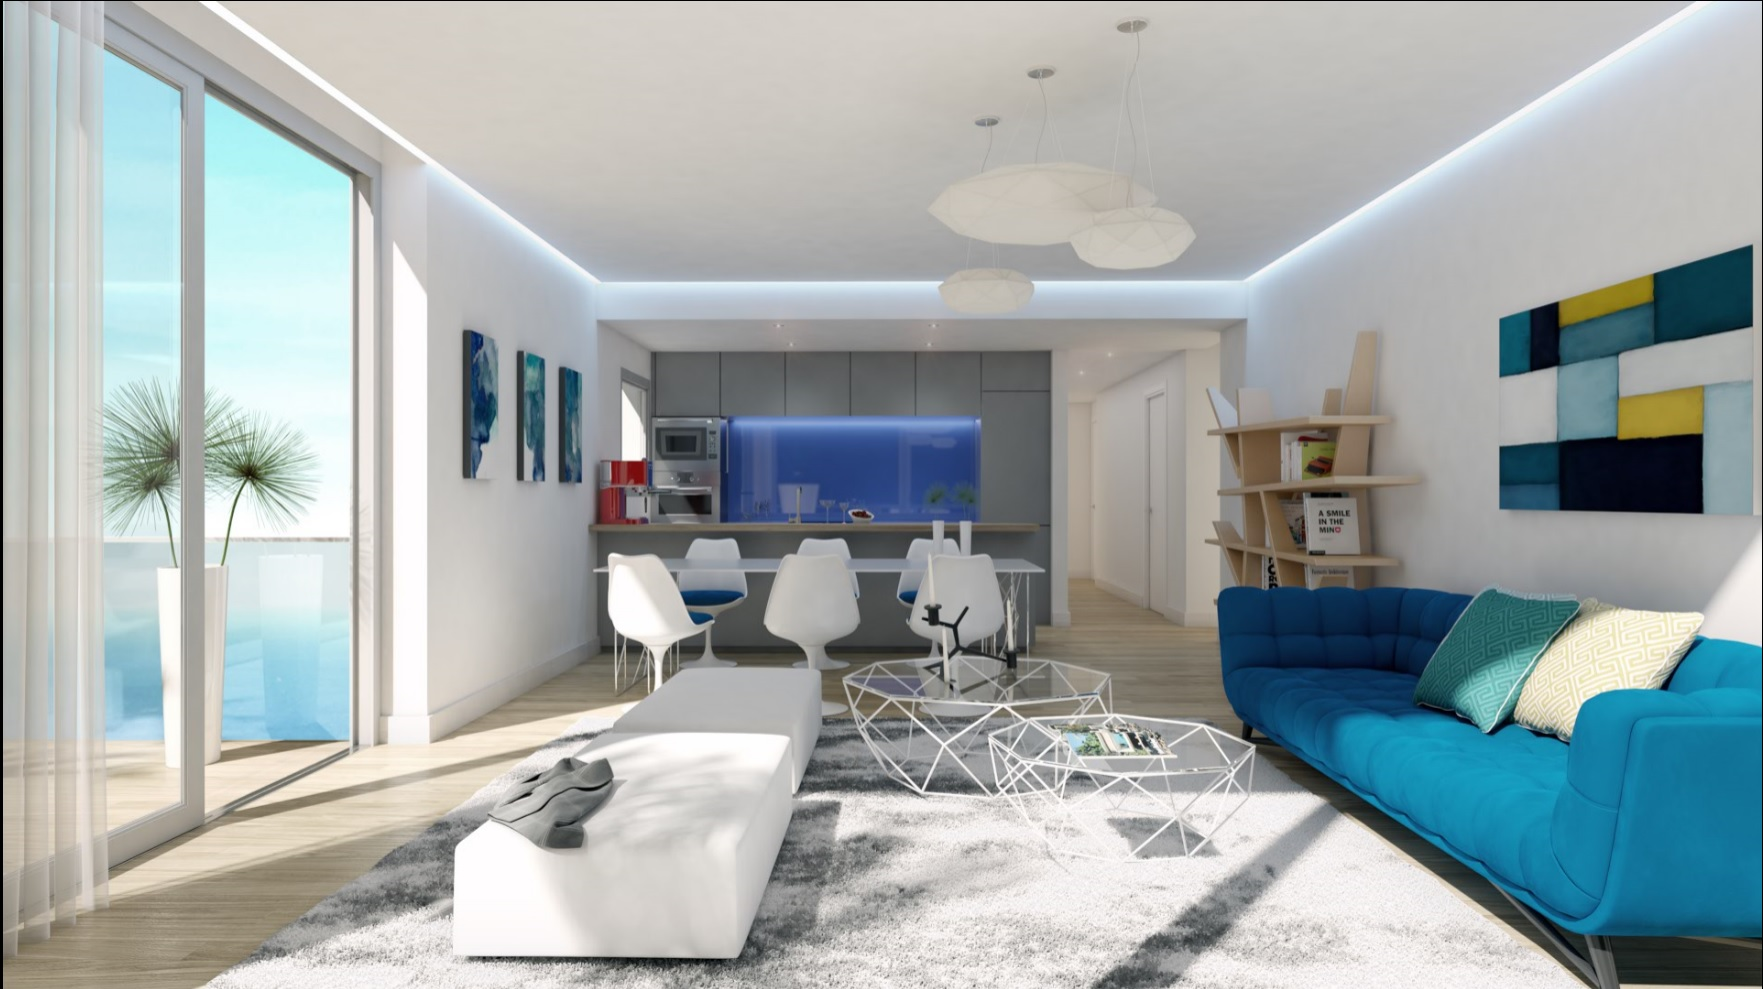 Apartment El Higueron Benalmadena